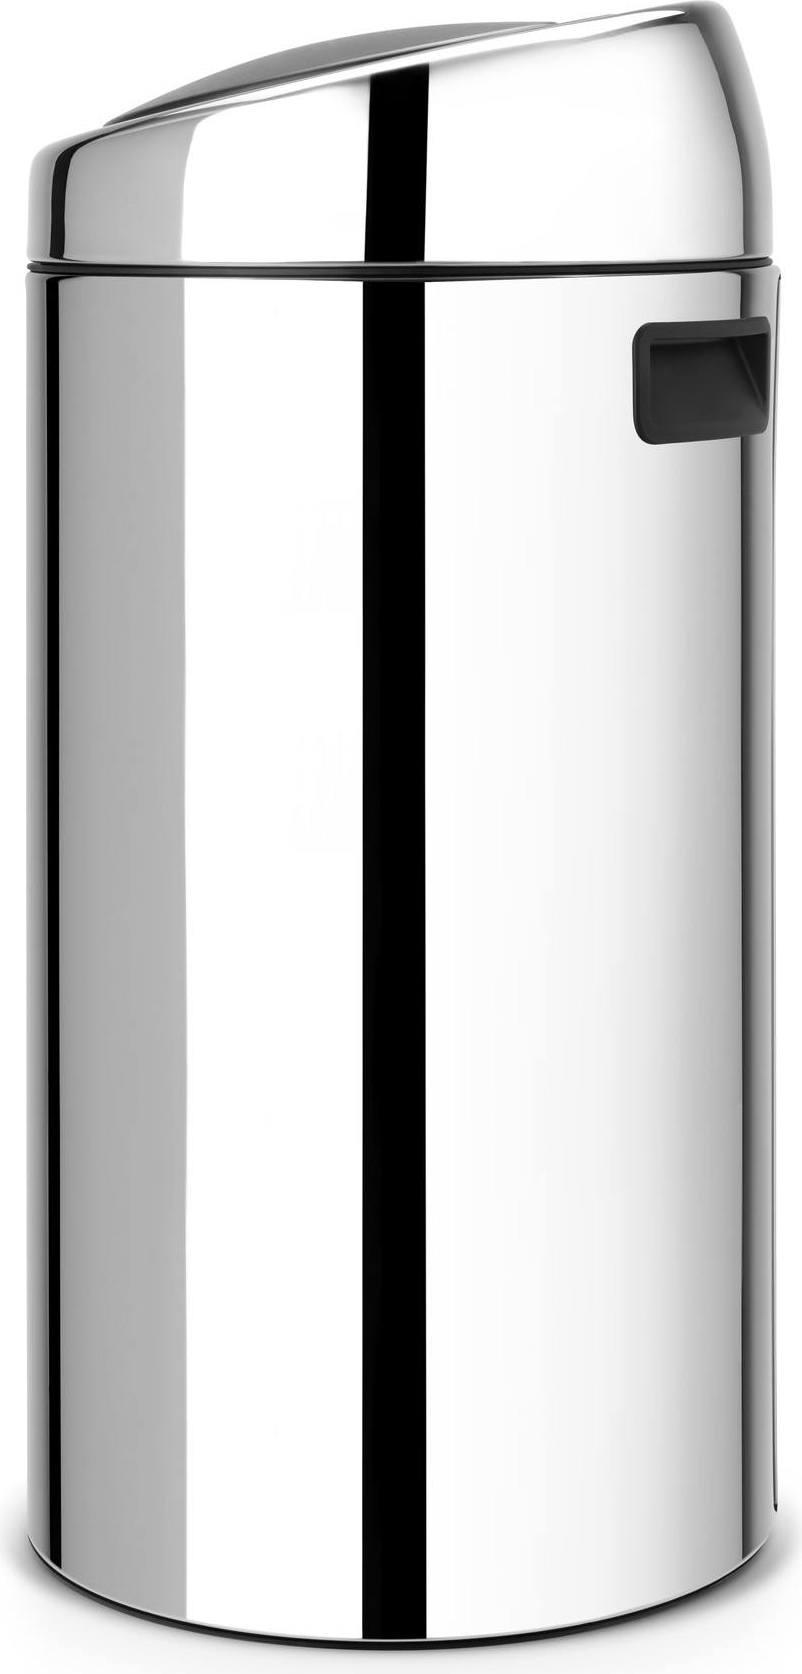 Touch Bin 45 Liter.Kosz Na Smieci Touch Bin De Luxe 45 L Brabantia 390821 Ff